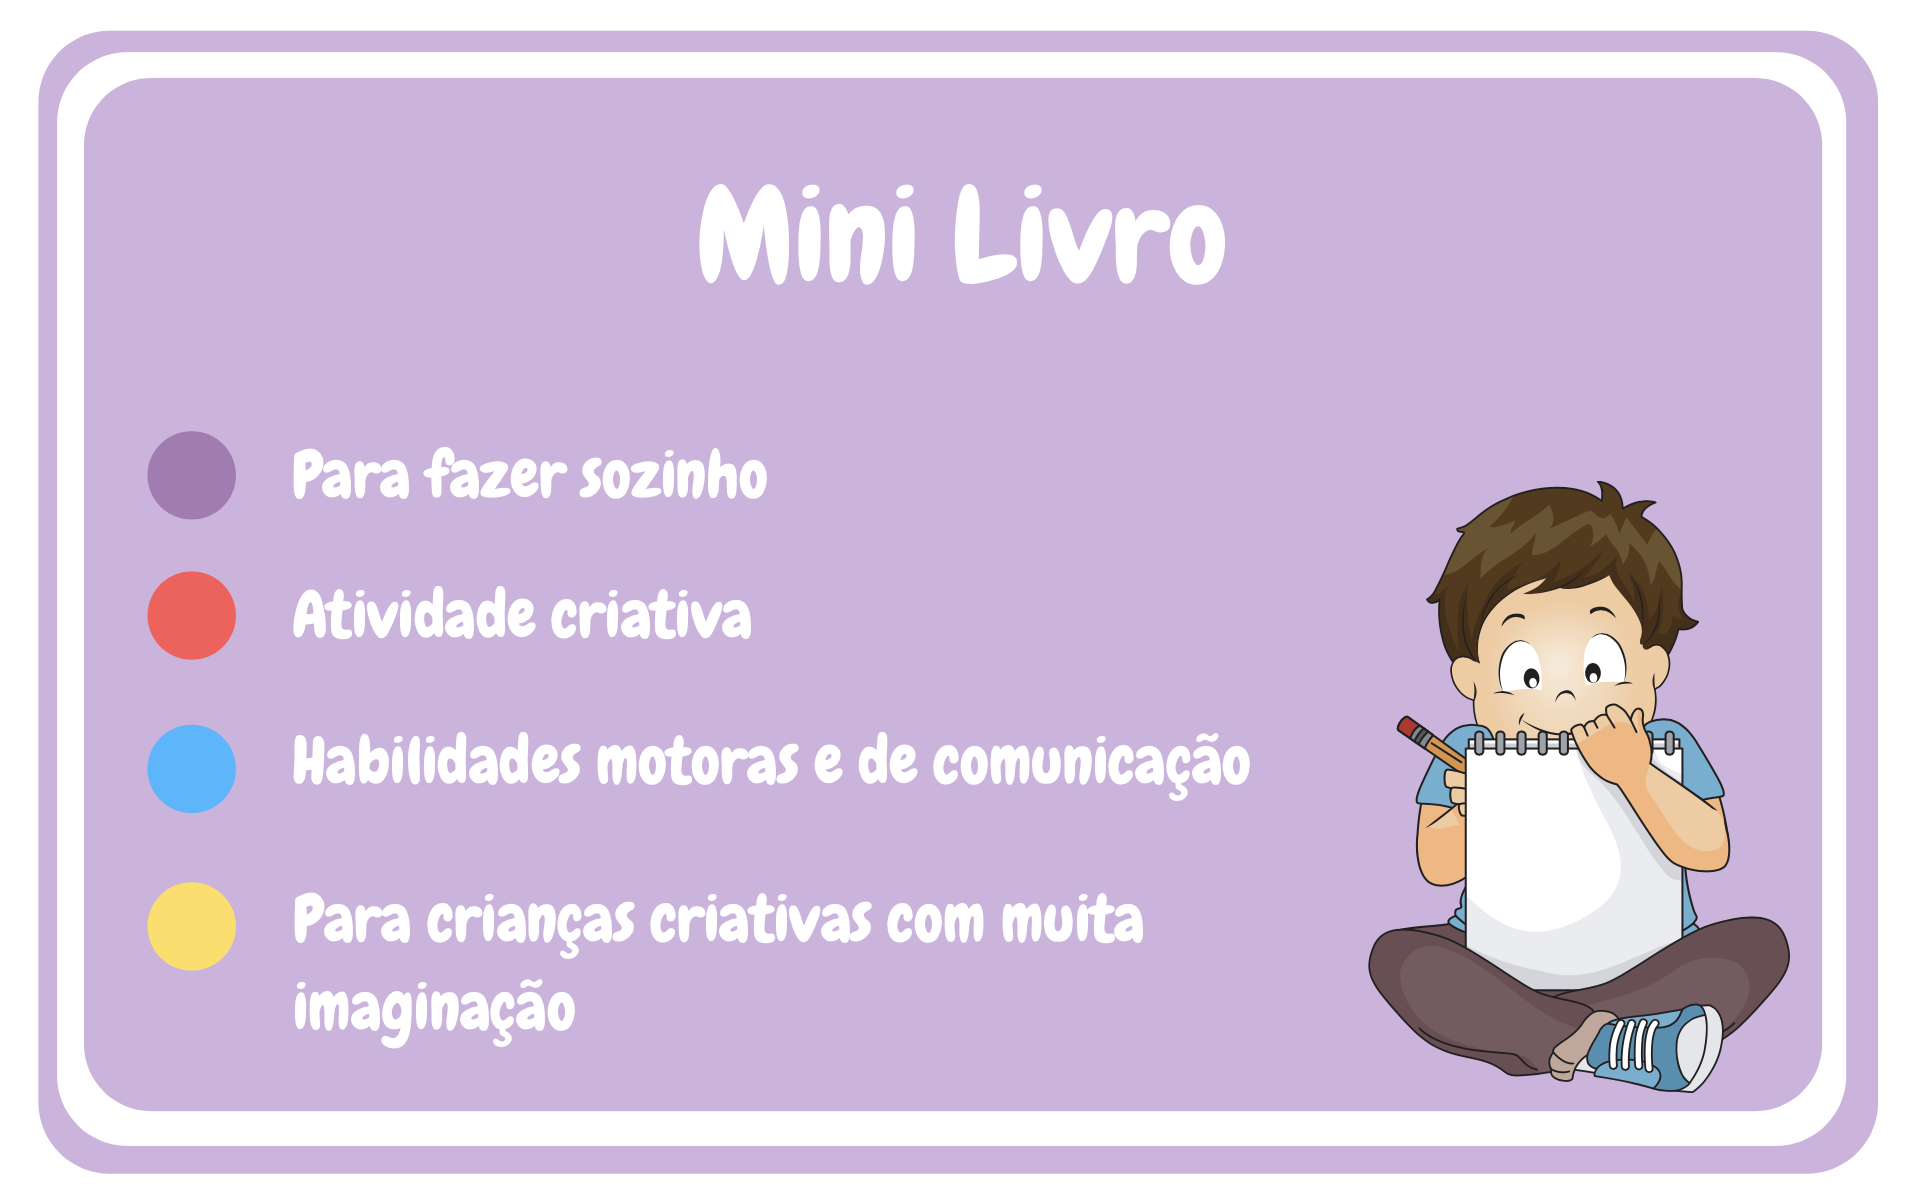 Mini Livro